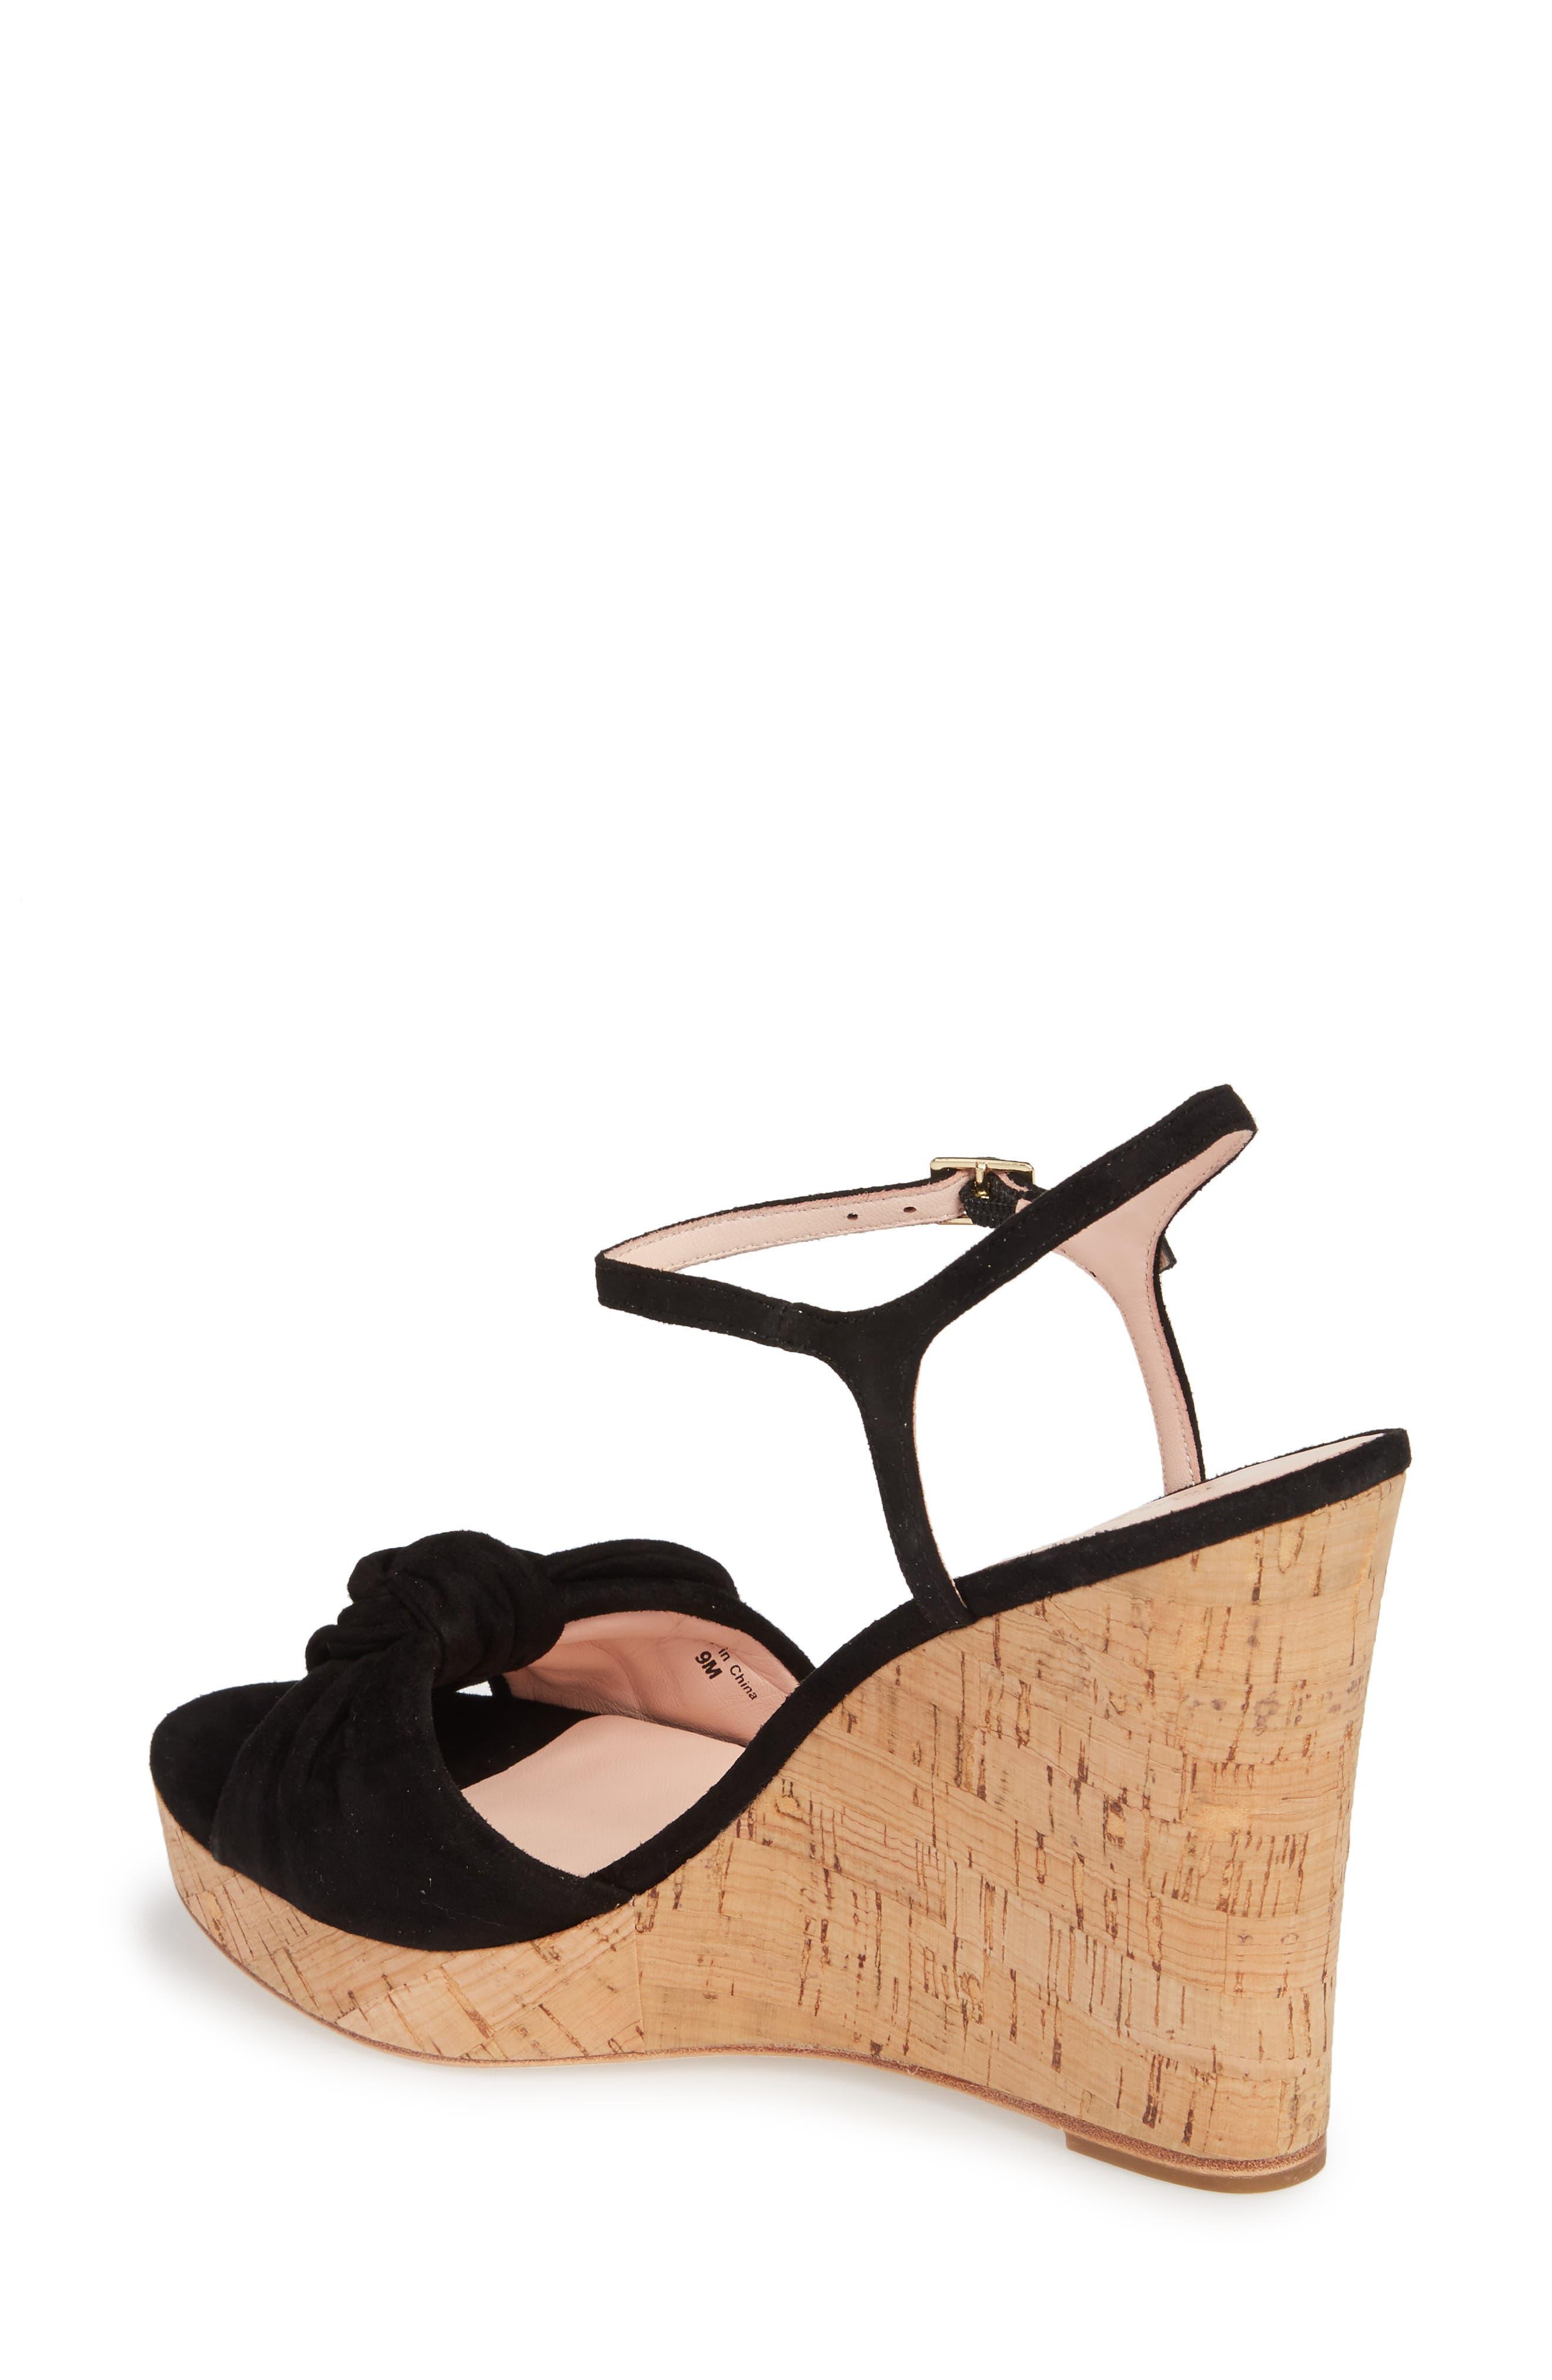 janae knot platform wedge sandal,                             Alternate thumbnail 2, color,                             001